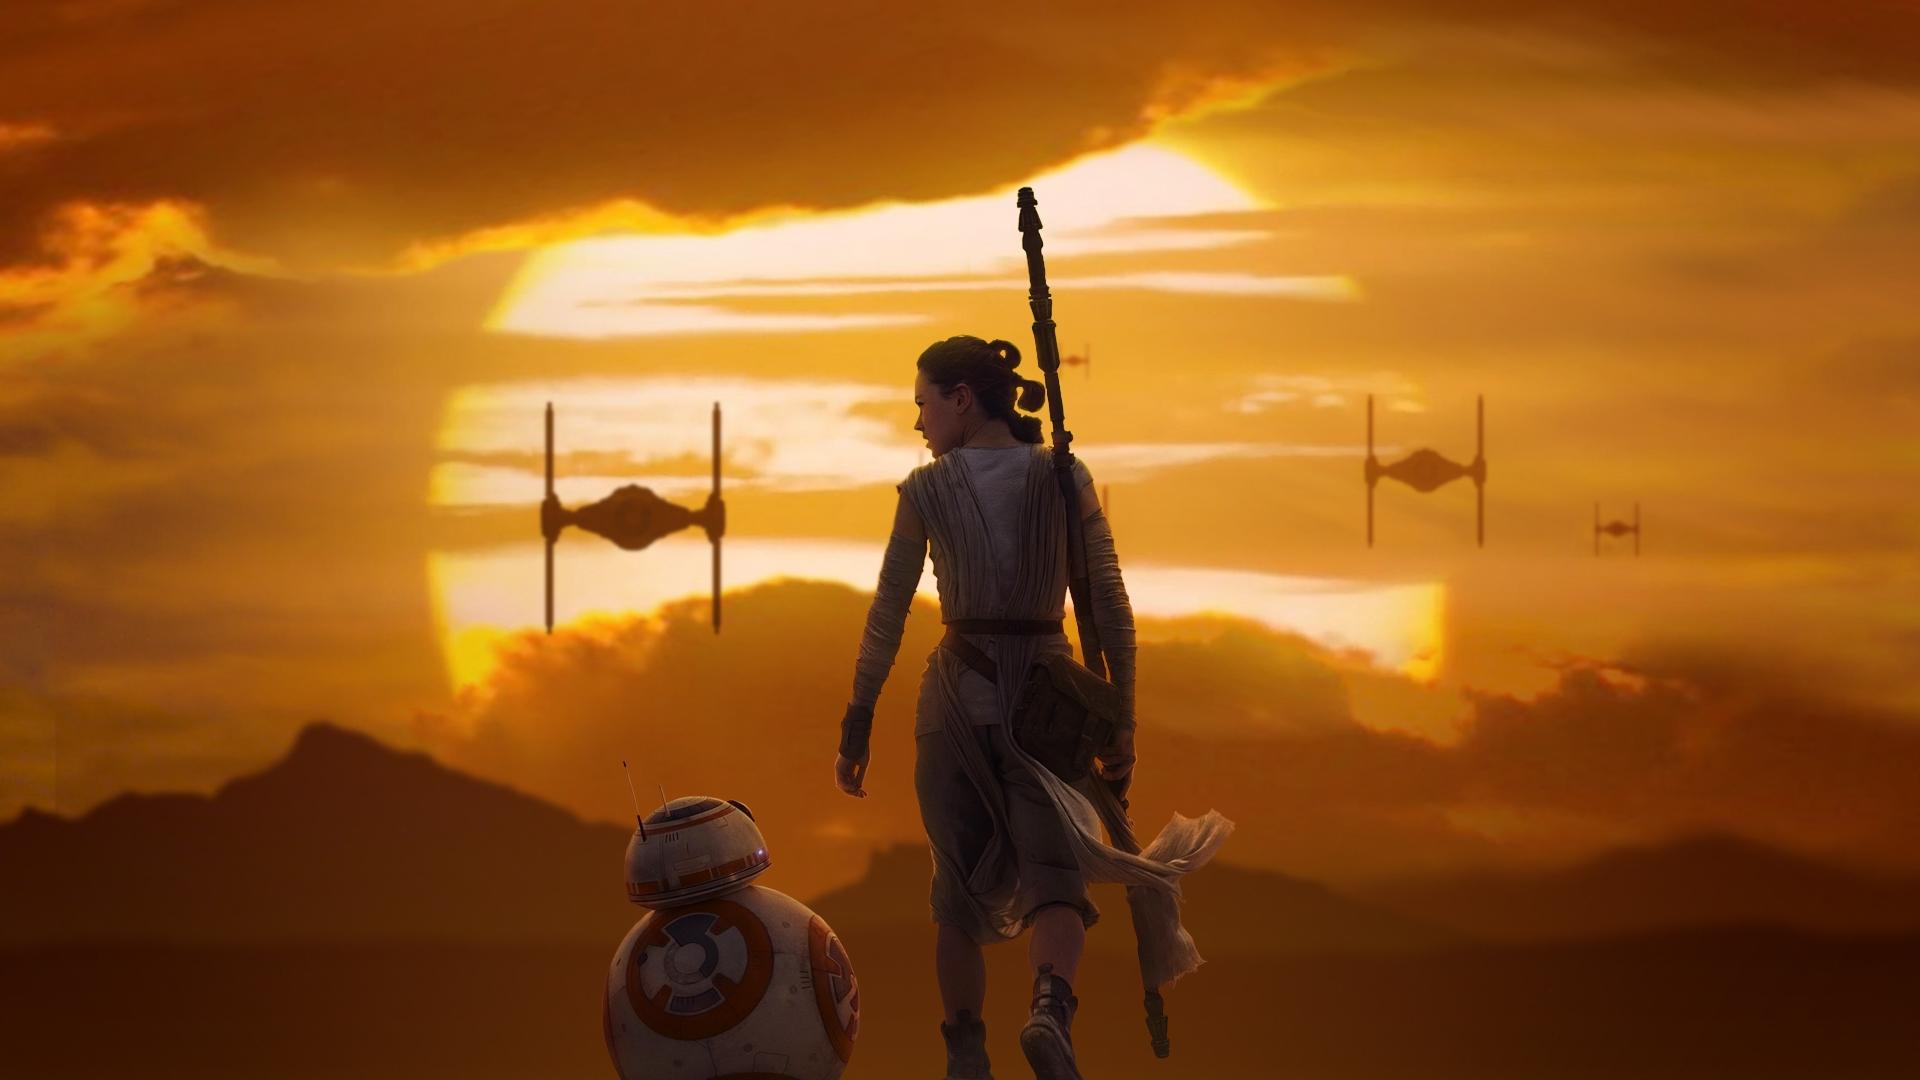 Rey BB 8 Star Wars The Force Awakens 1920x1080